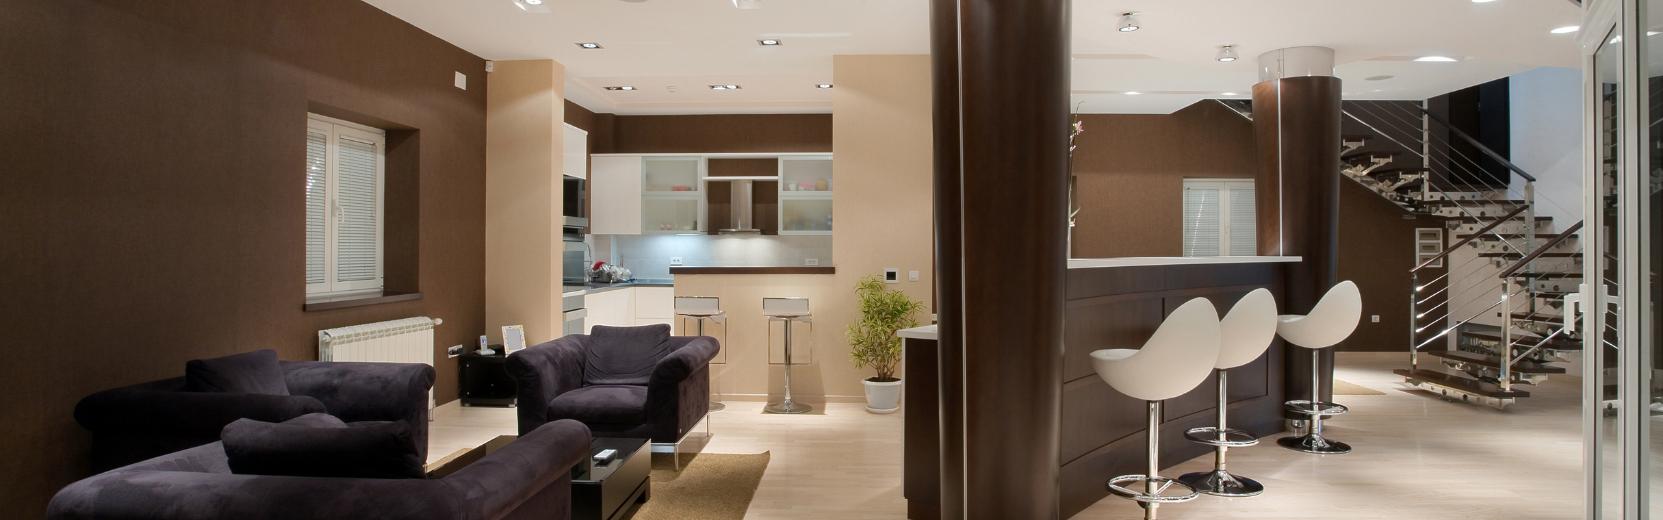 Modern ház enteriőr